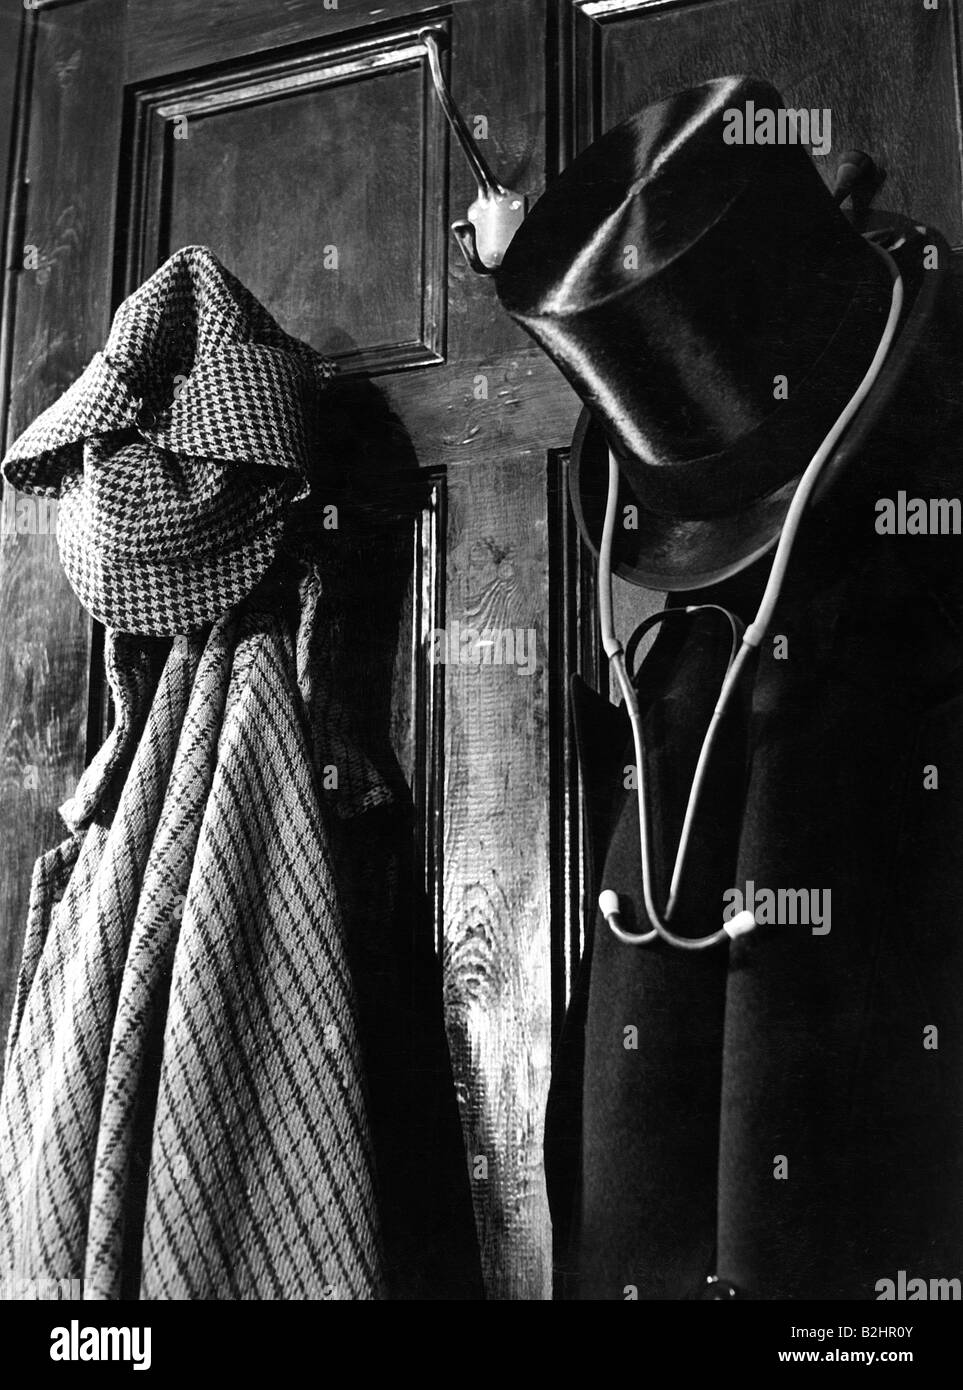 Sherlock Holmes, hero of novel, by Sir Arthur Conan Doyle, garment of Sherlock Holmes and Dr. Watson, Additional - Stock Image